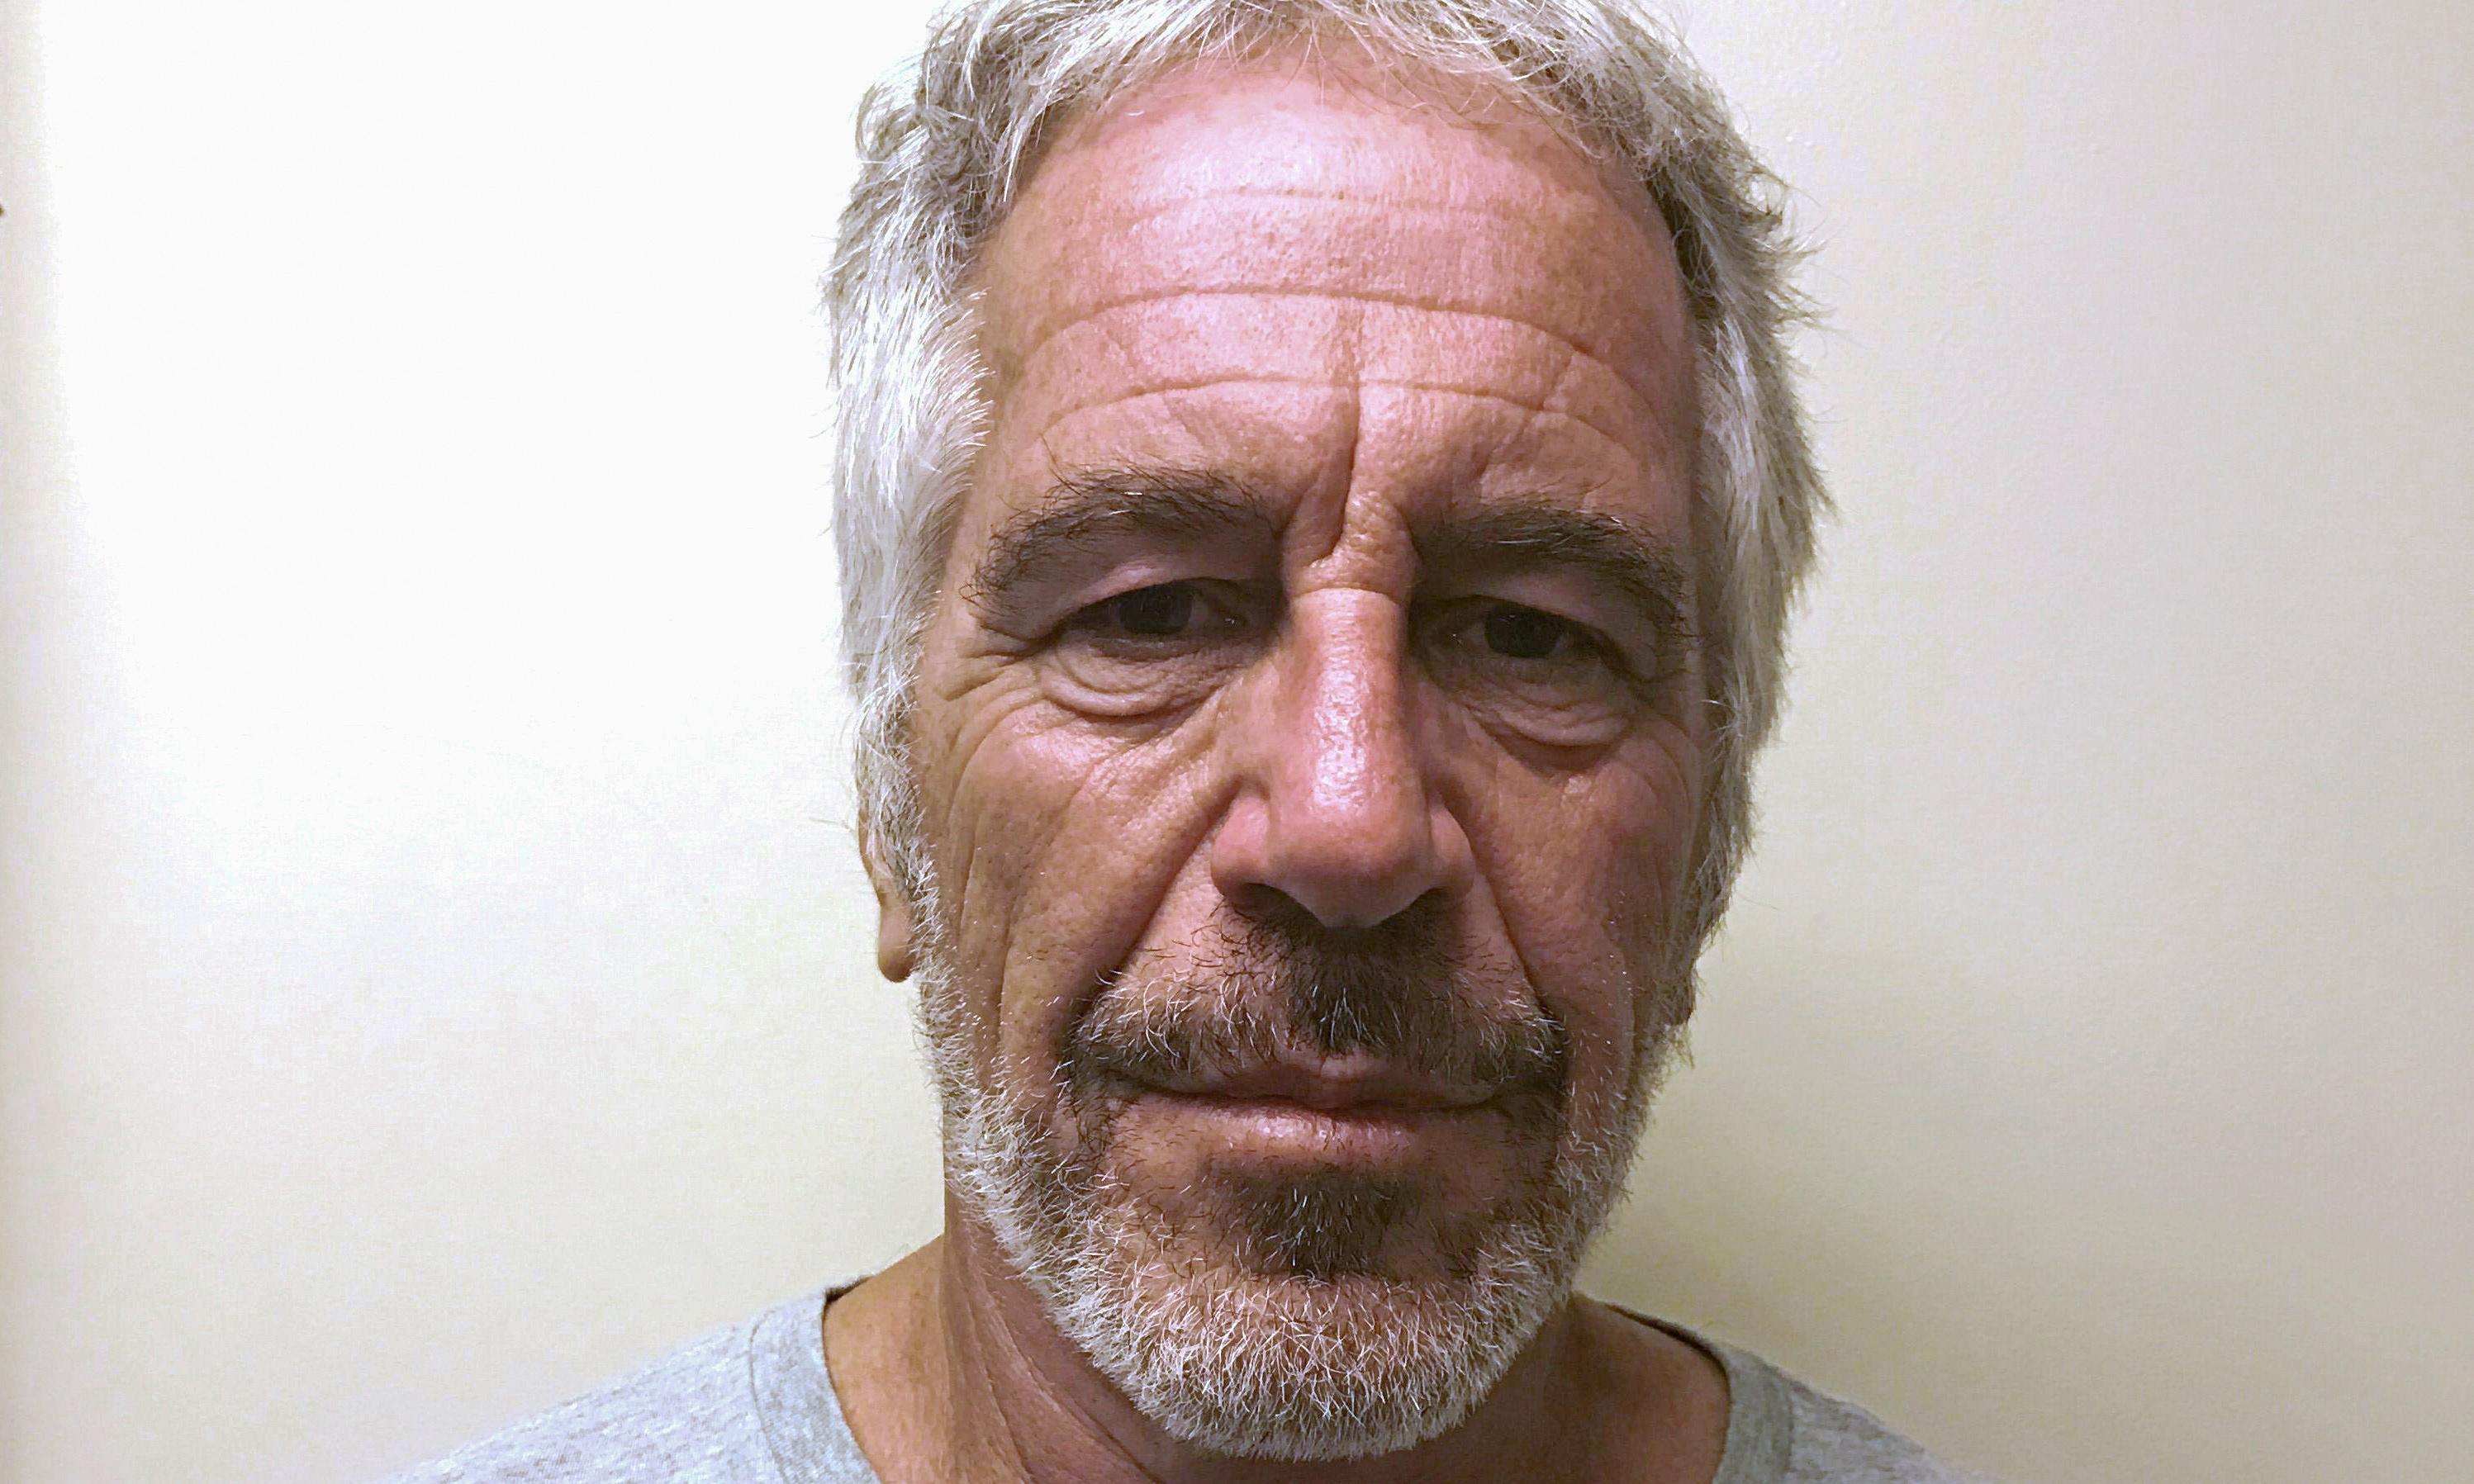 Jeffrey Epstein: diamonds, cash and fake passport found in raid, prosecutors say